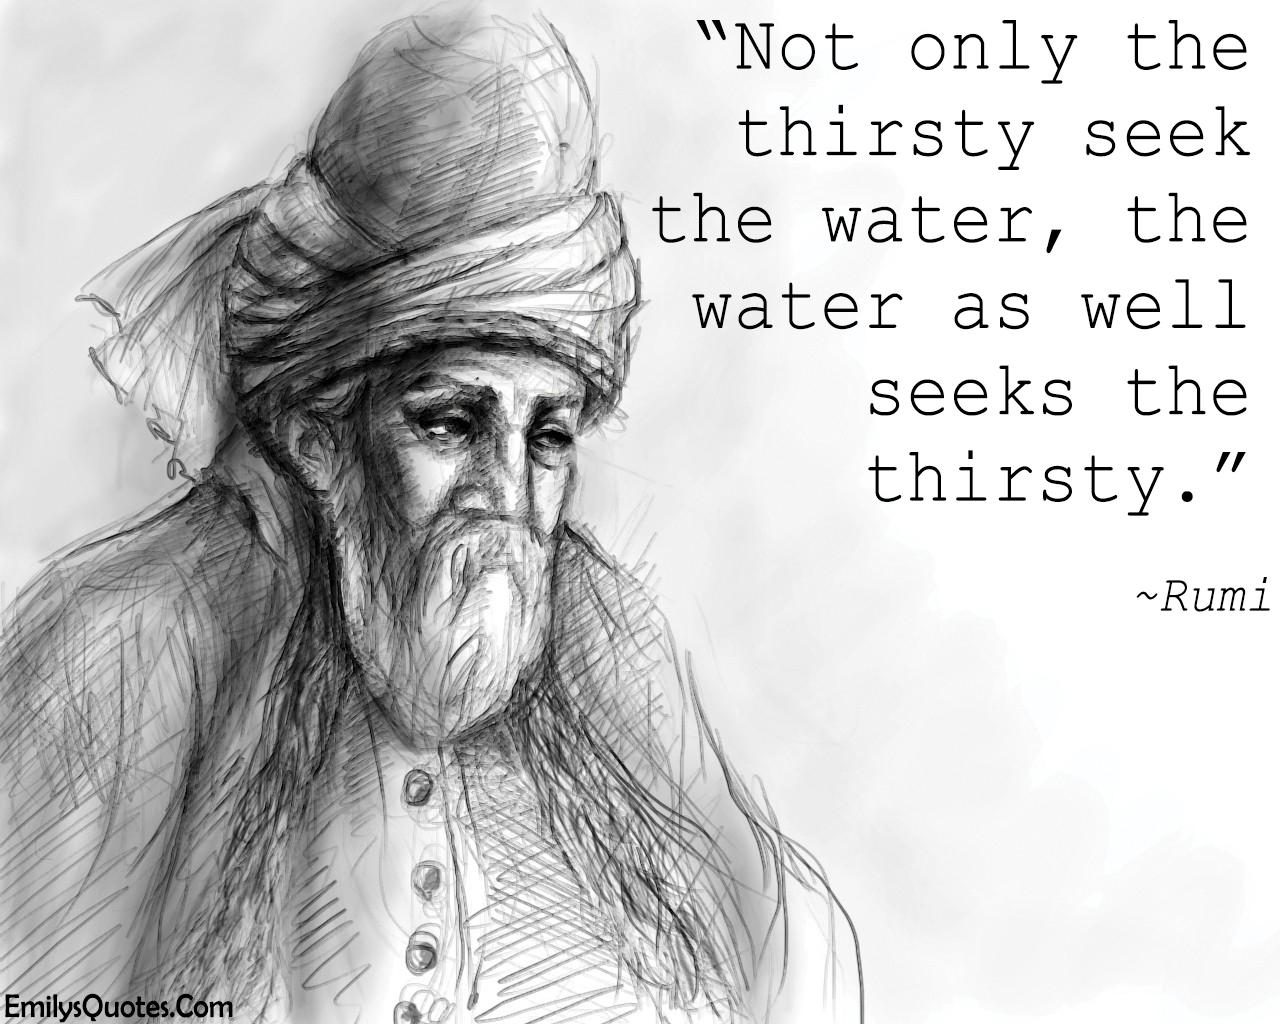 EmilysQuotes.Com - wisdom, need, Rumi, intelligence, great